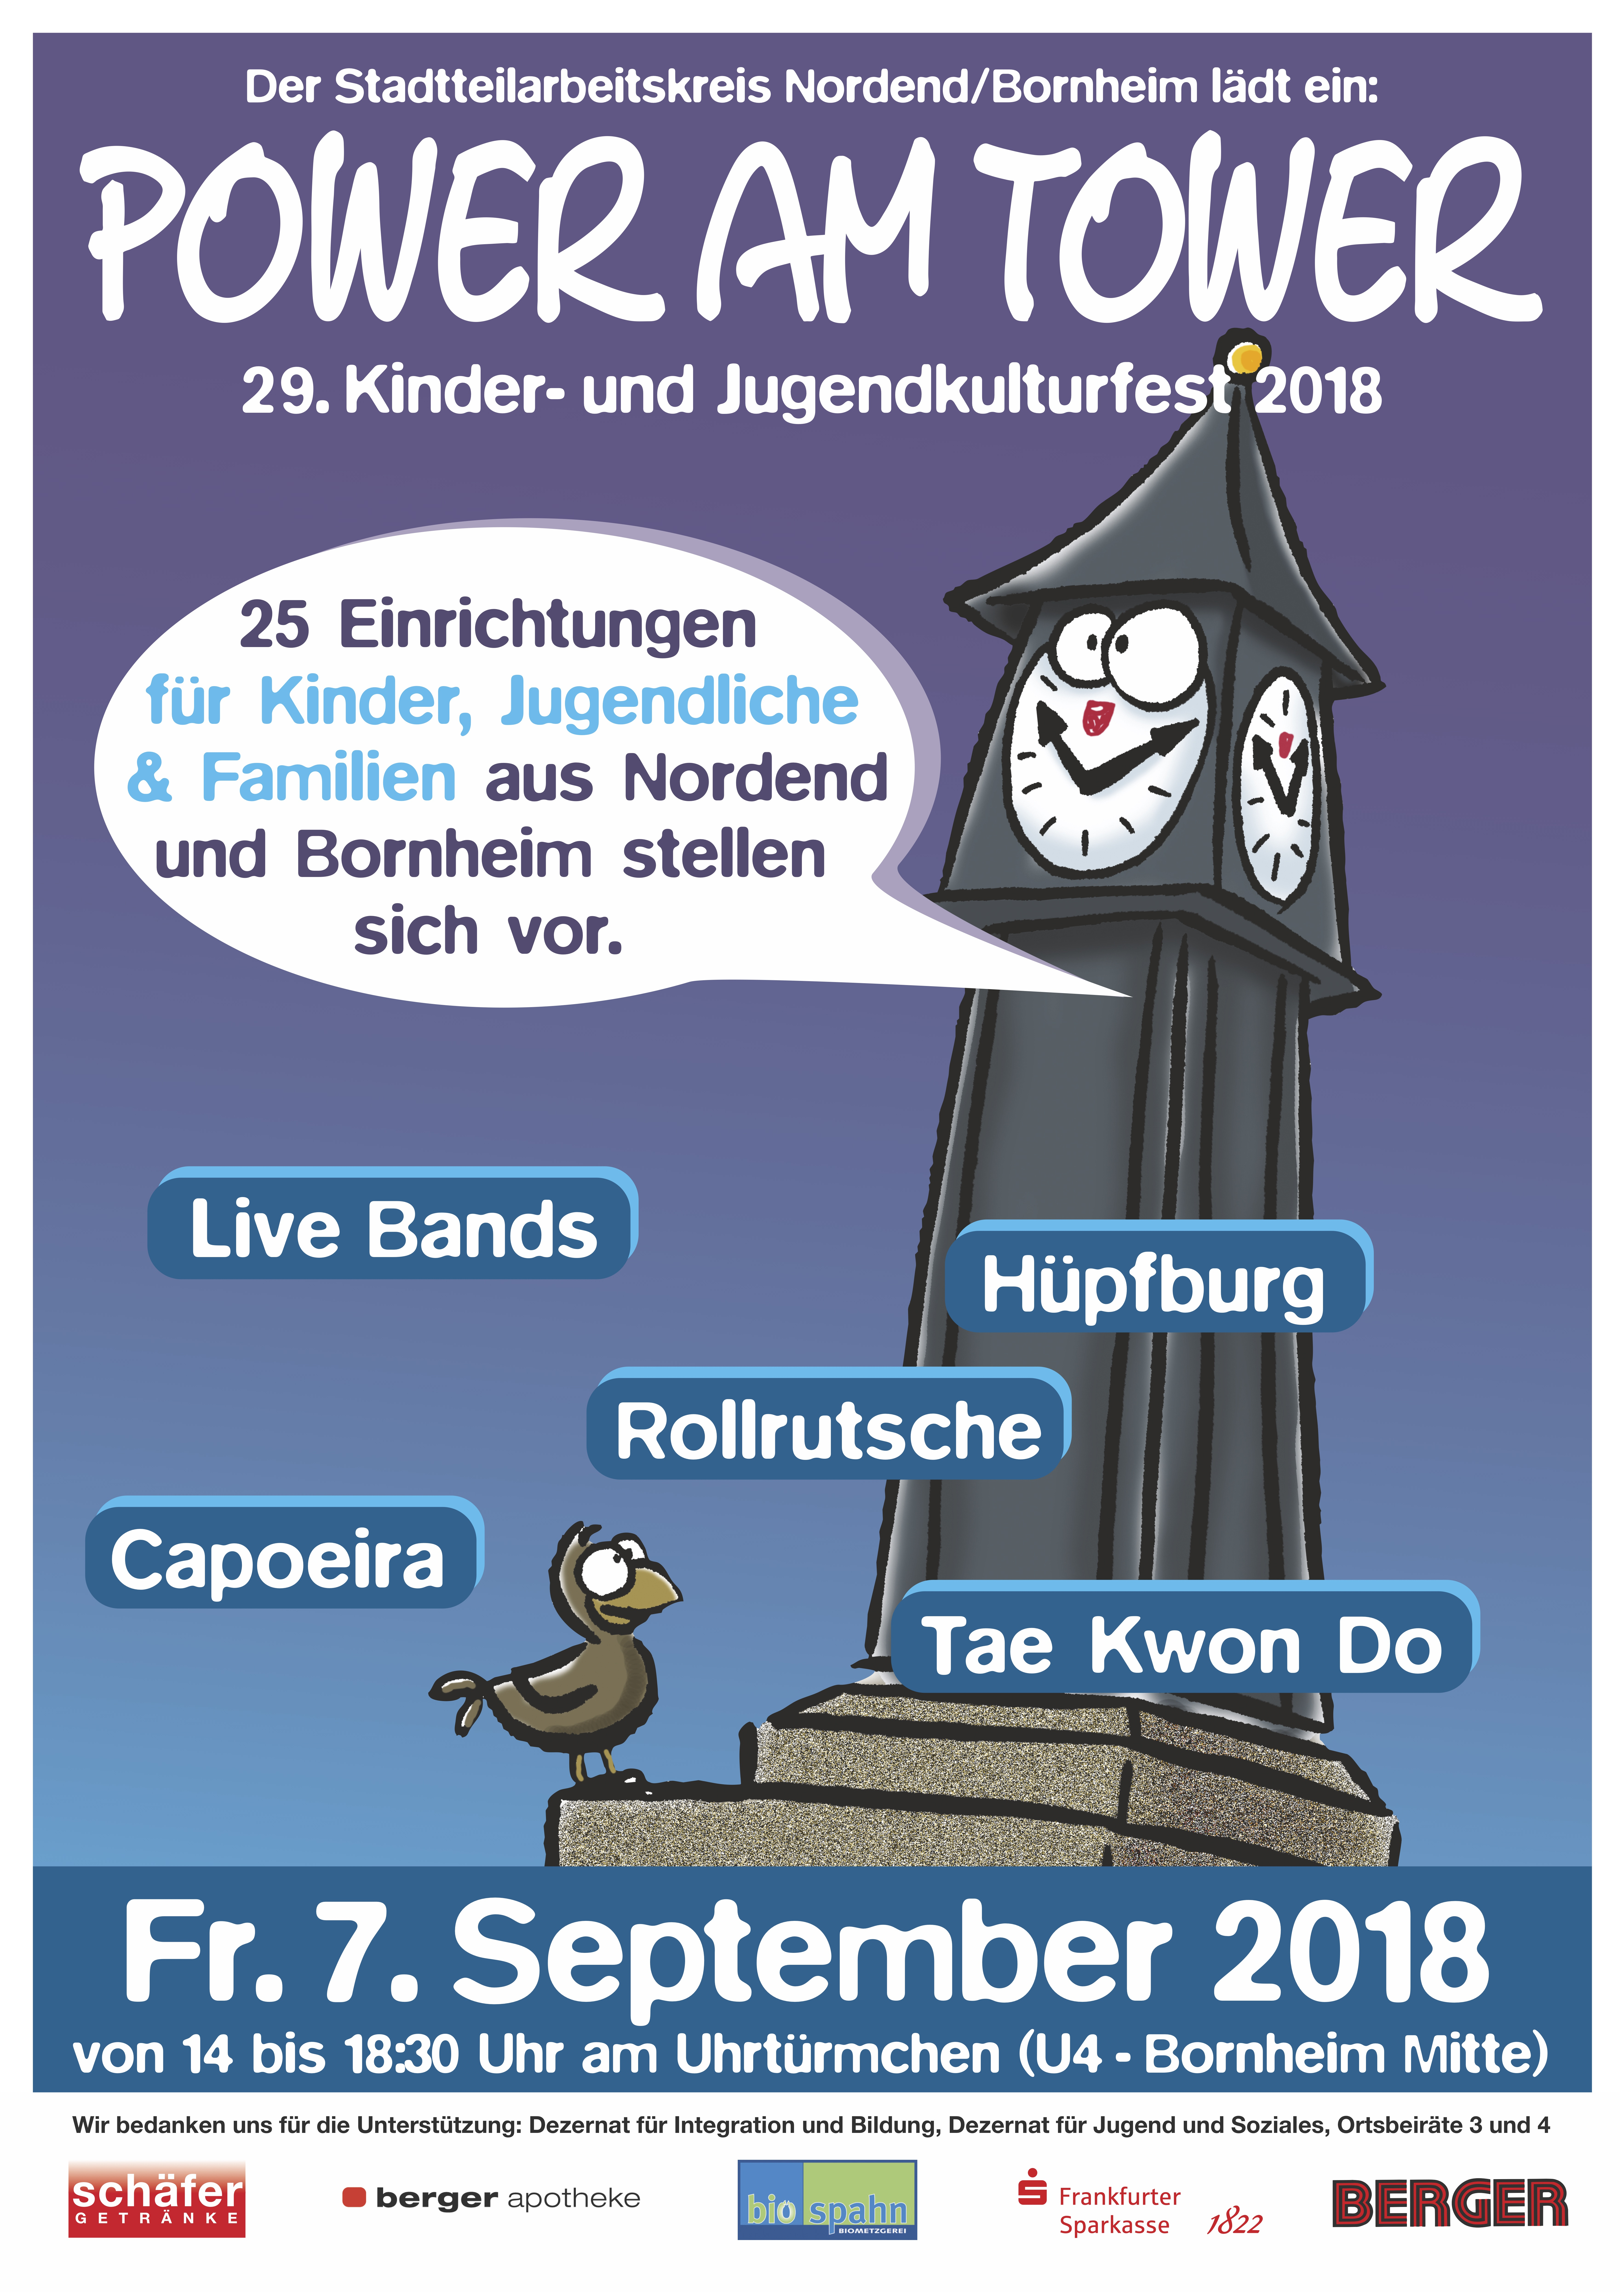 http://www.cvjm-frankfurt.de/blog/power2018_plakat02.jpg